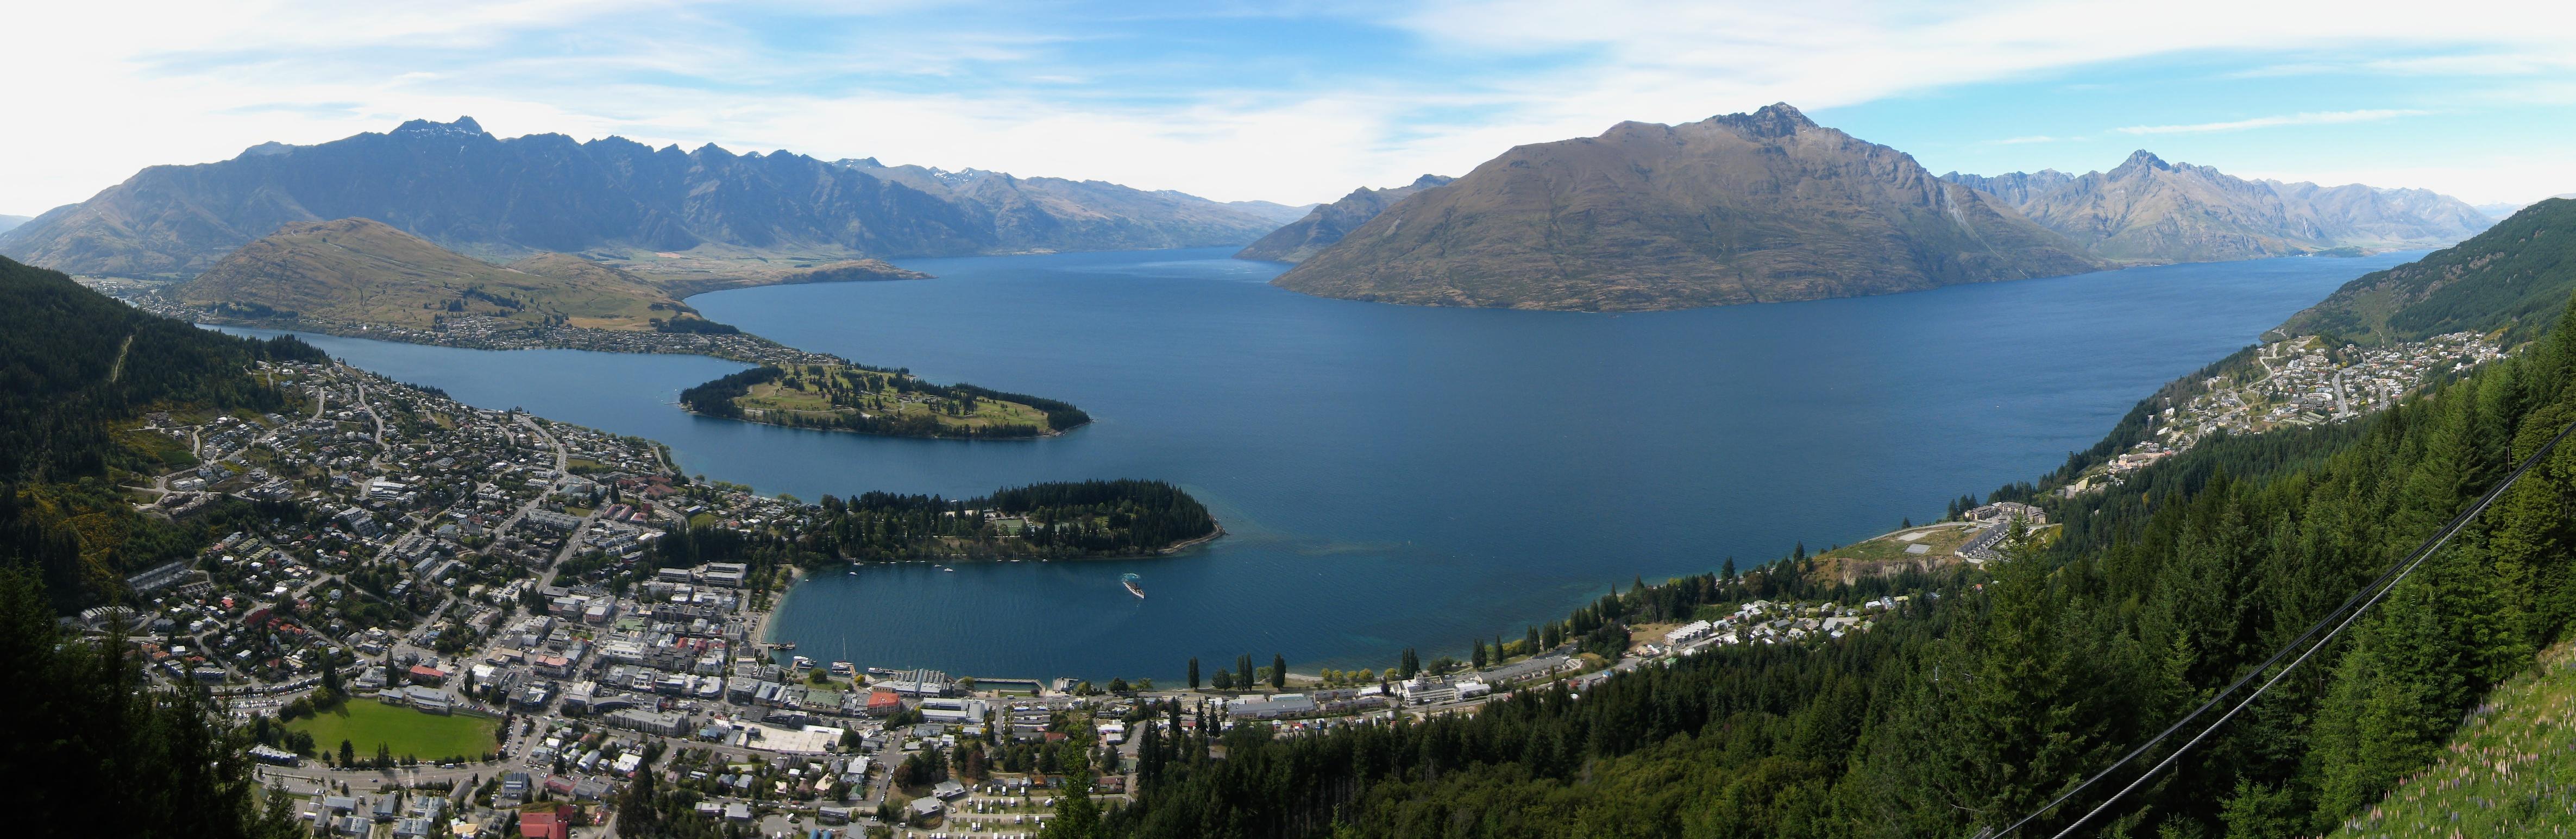 Wakatipu Lake svg #10, Download drawings